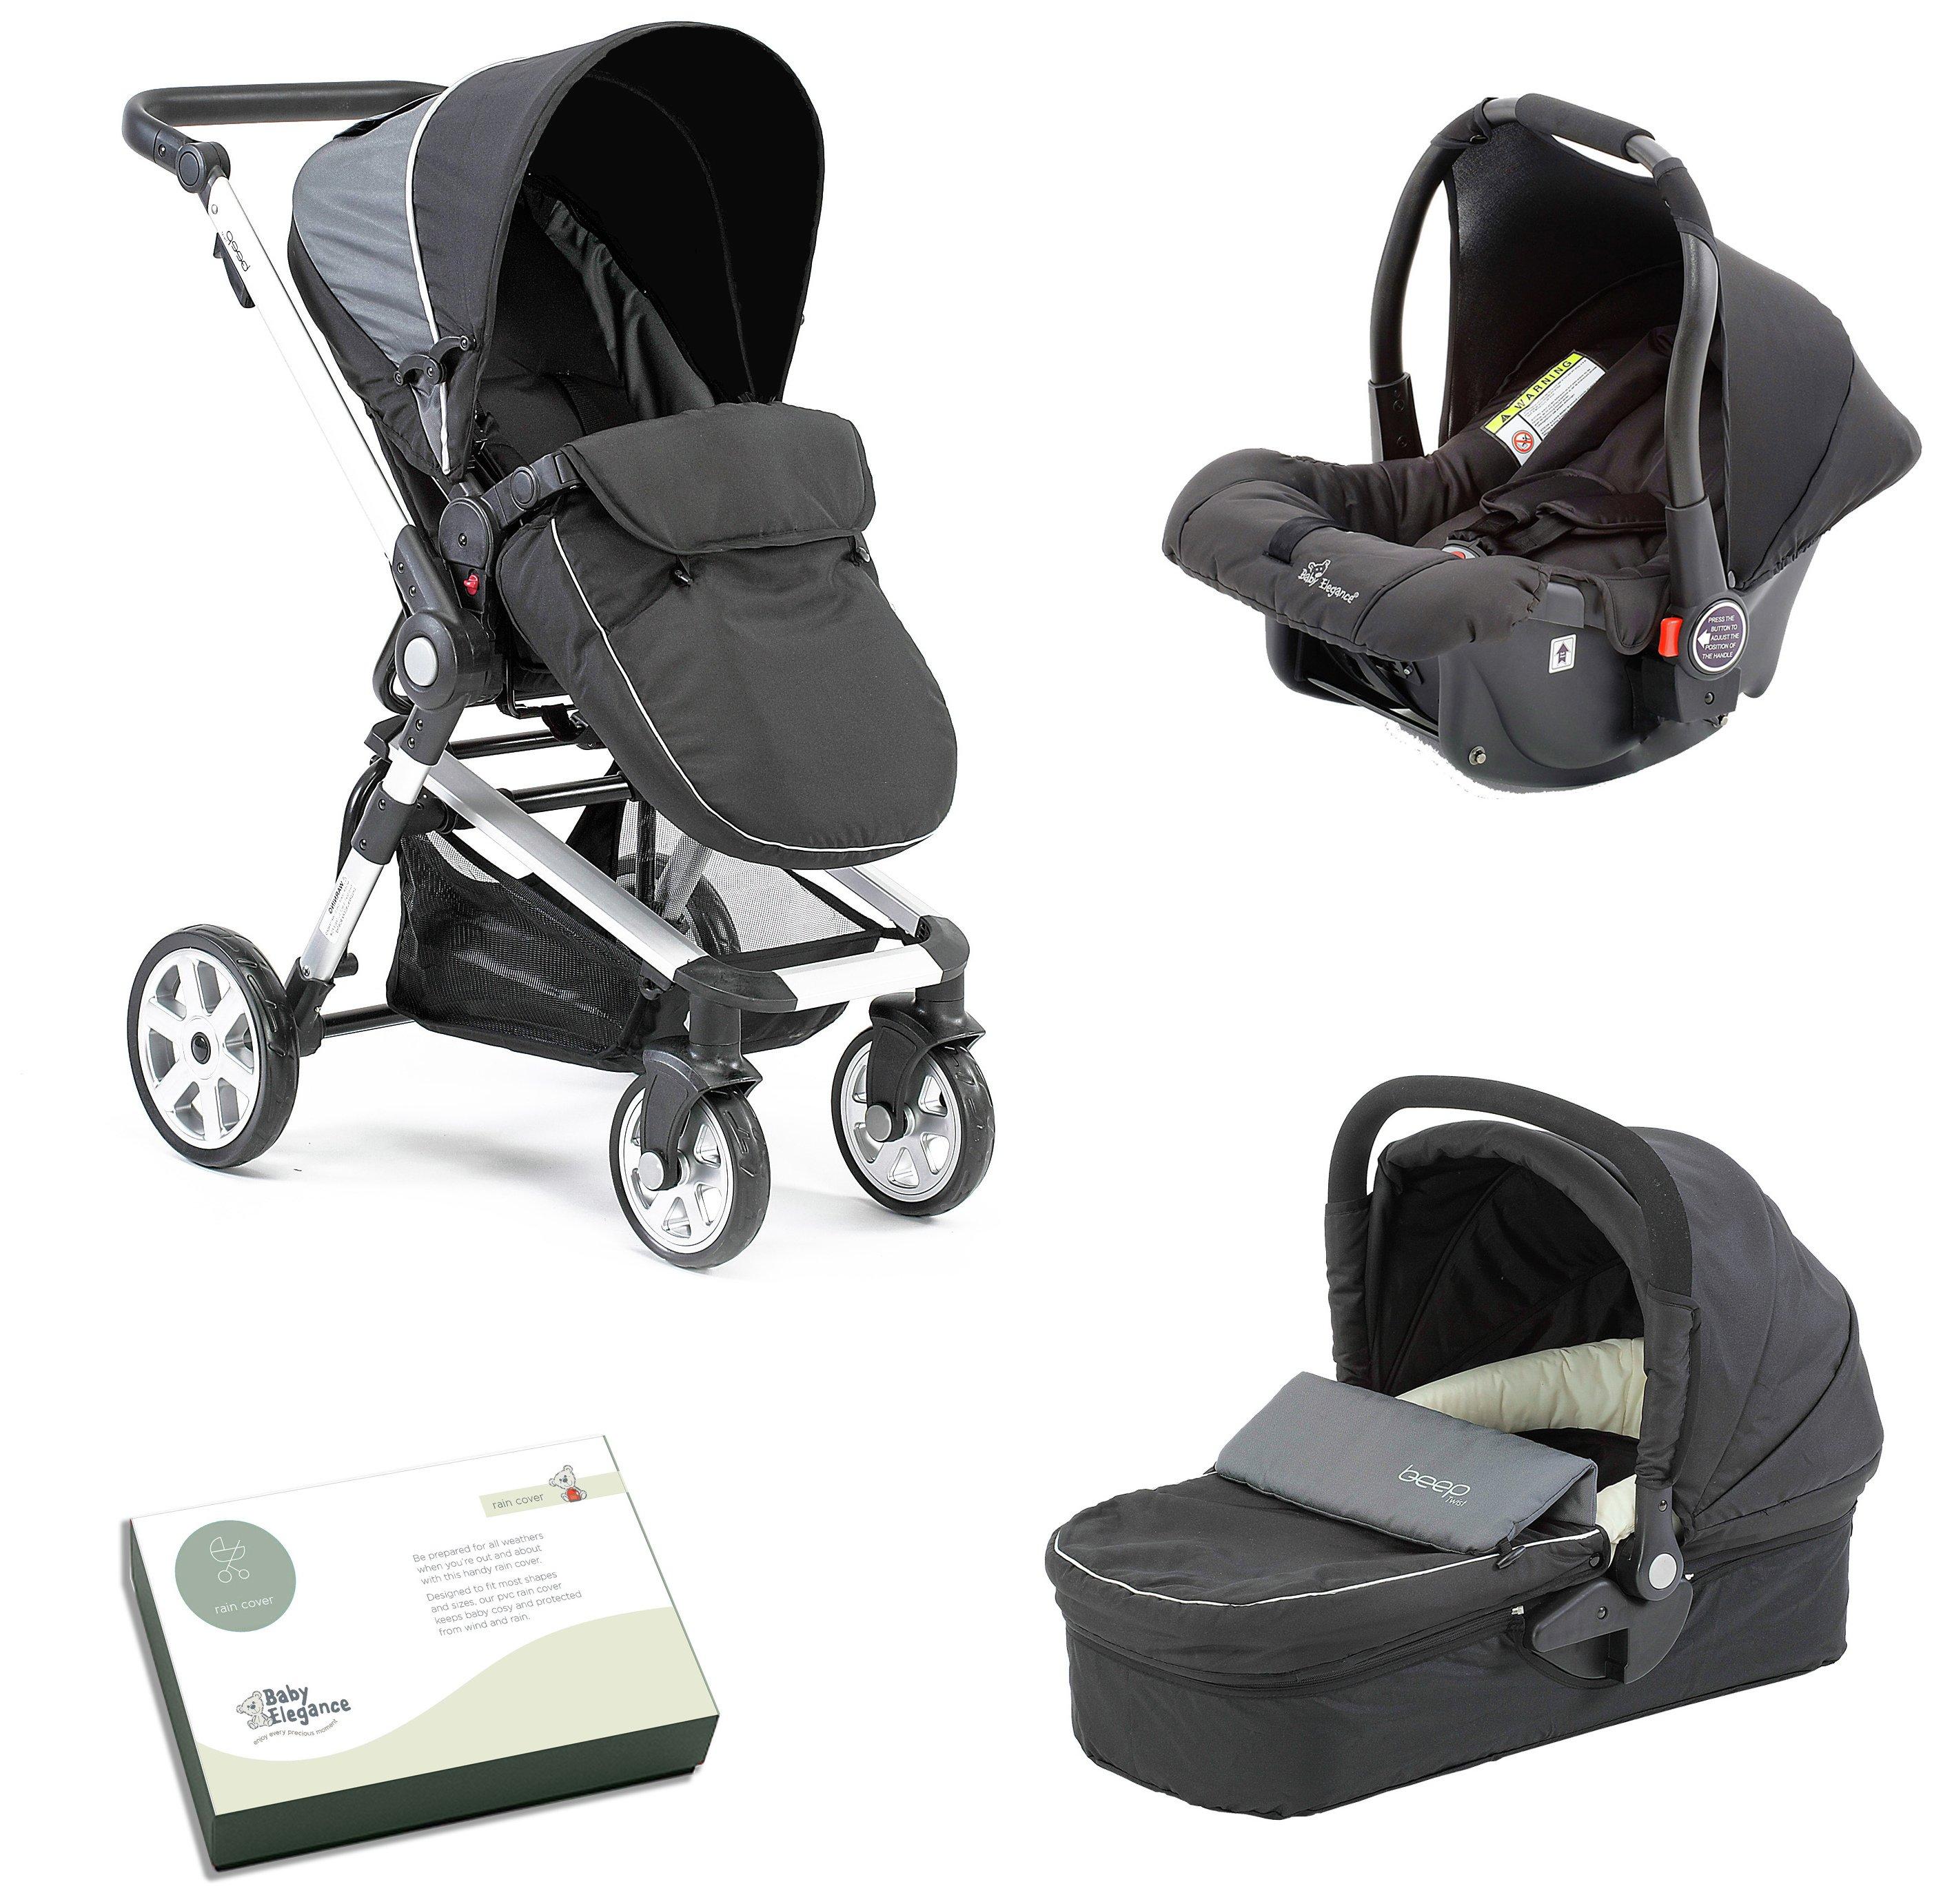 Image of Baby Elegance Beep Twist Travel System - Black.